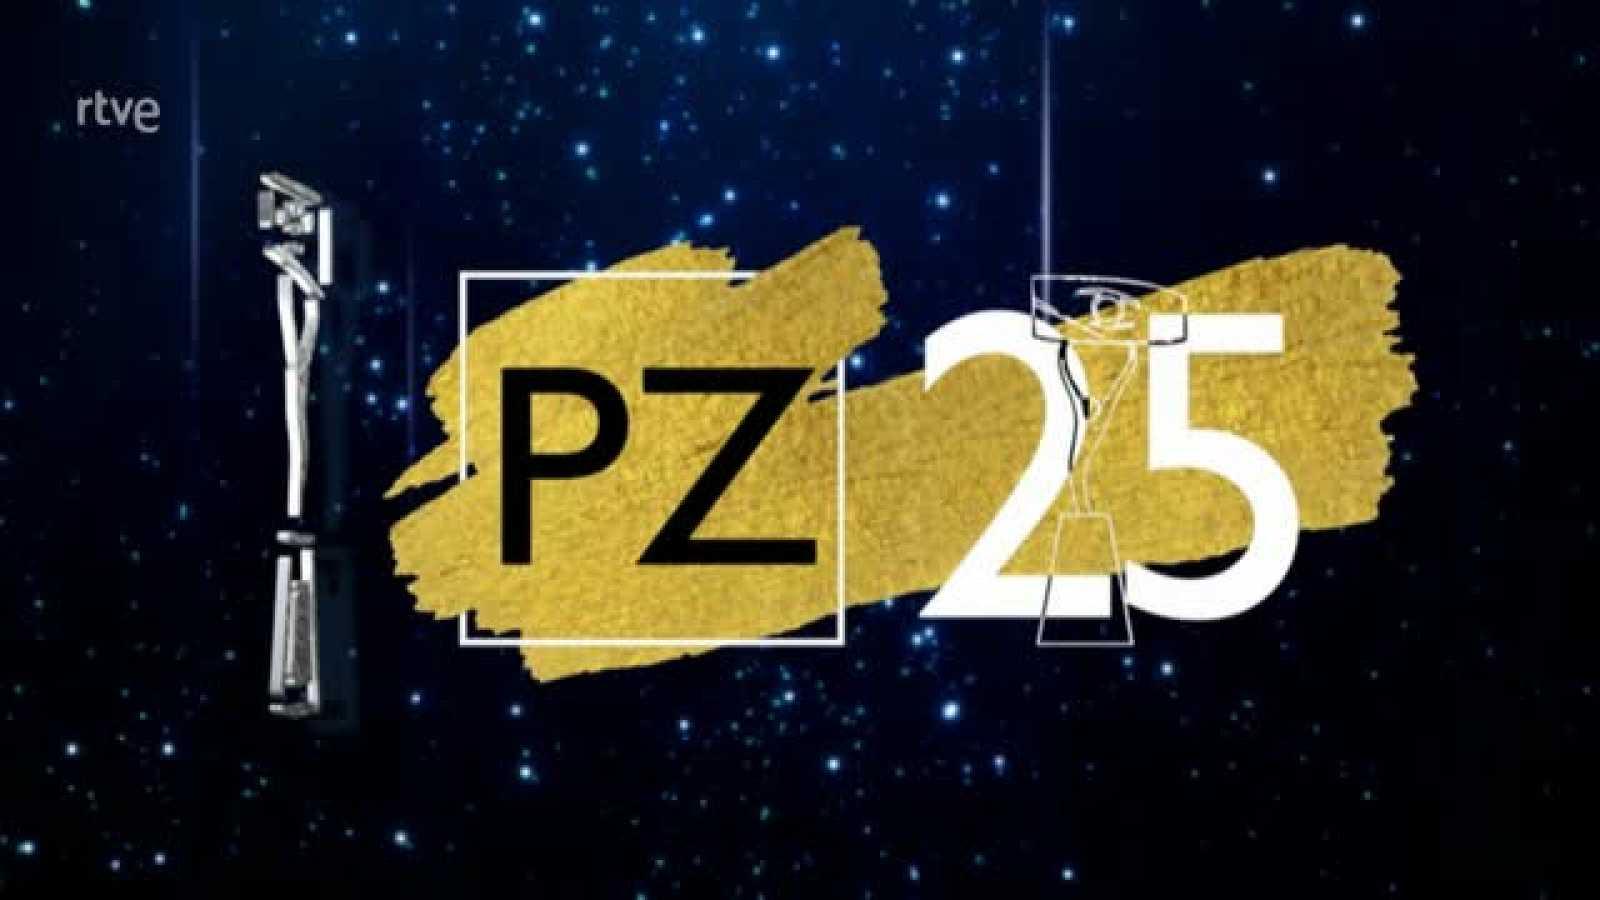 Entrega dels XXV Premis Zapping